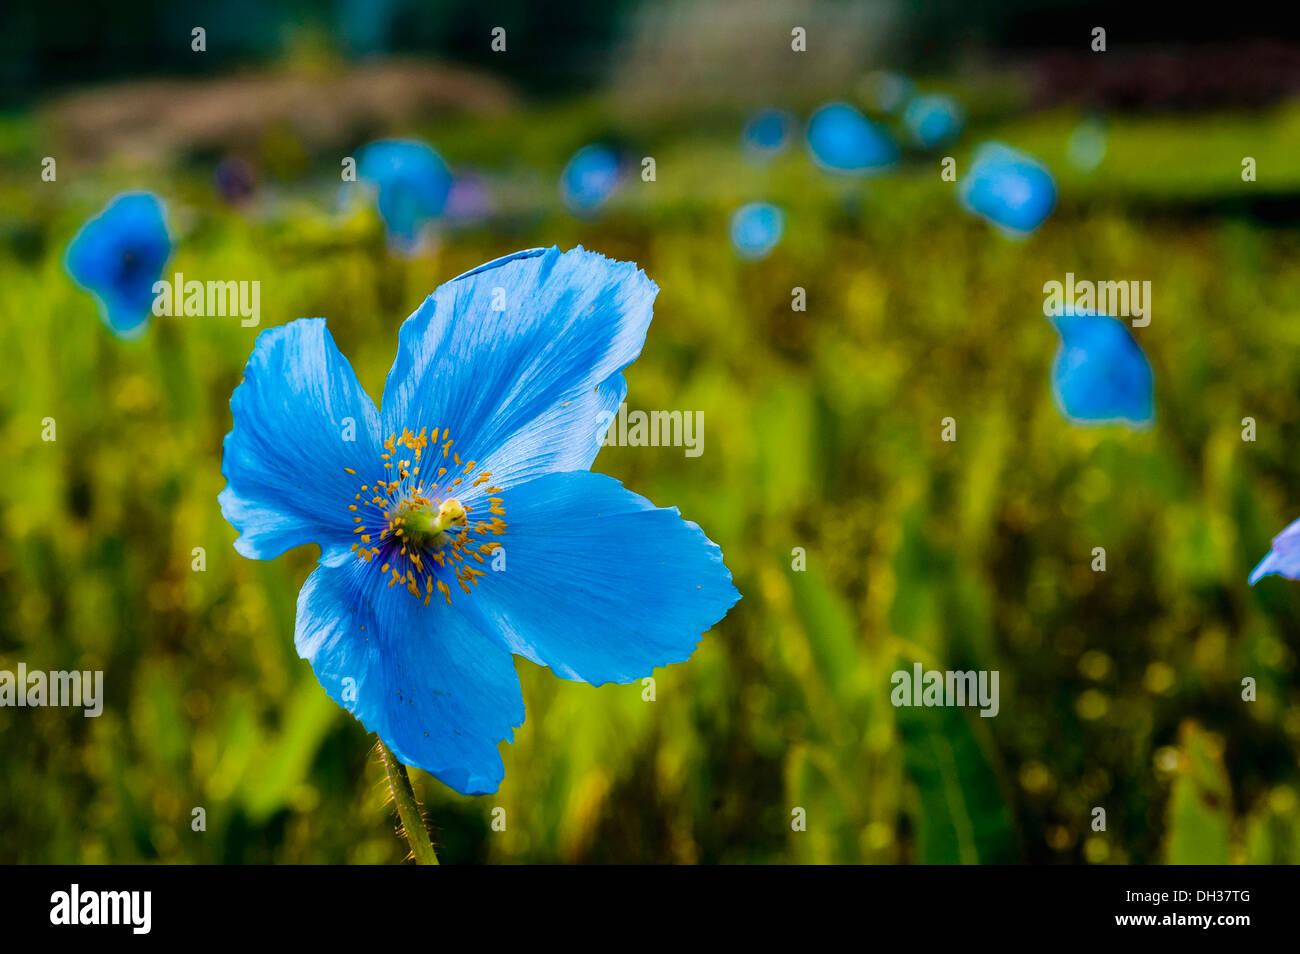 Himalayan blue poppy Meconopsis betonicifolia. Field of blue poppies ...